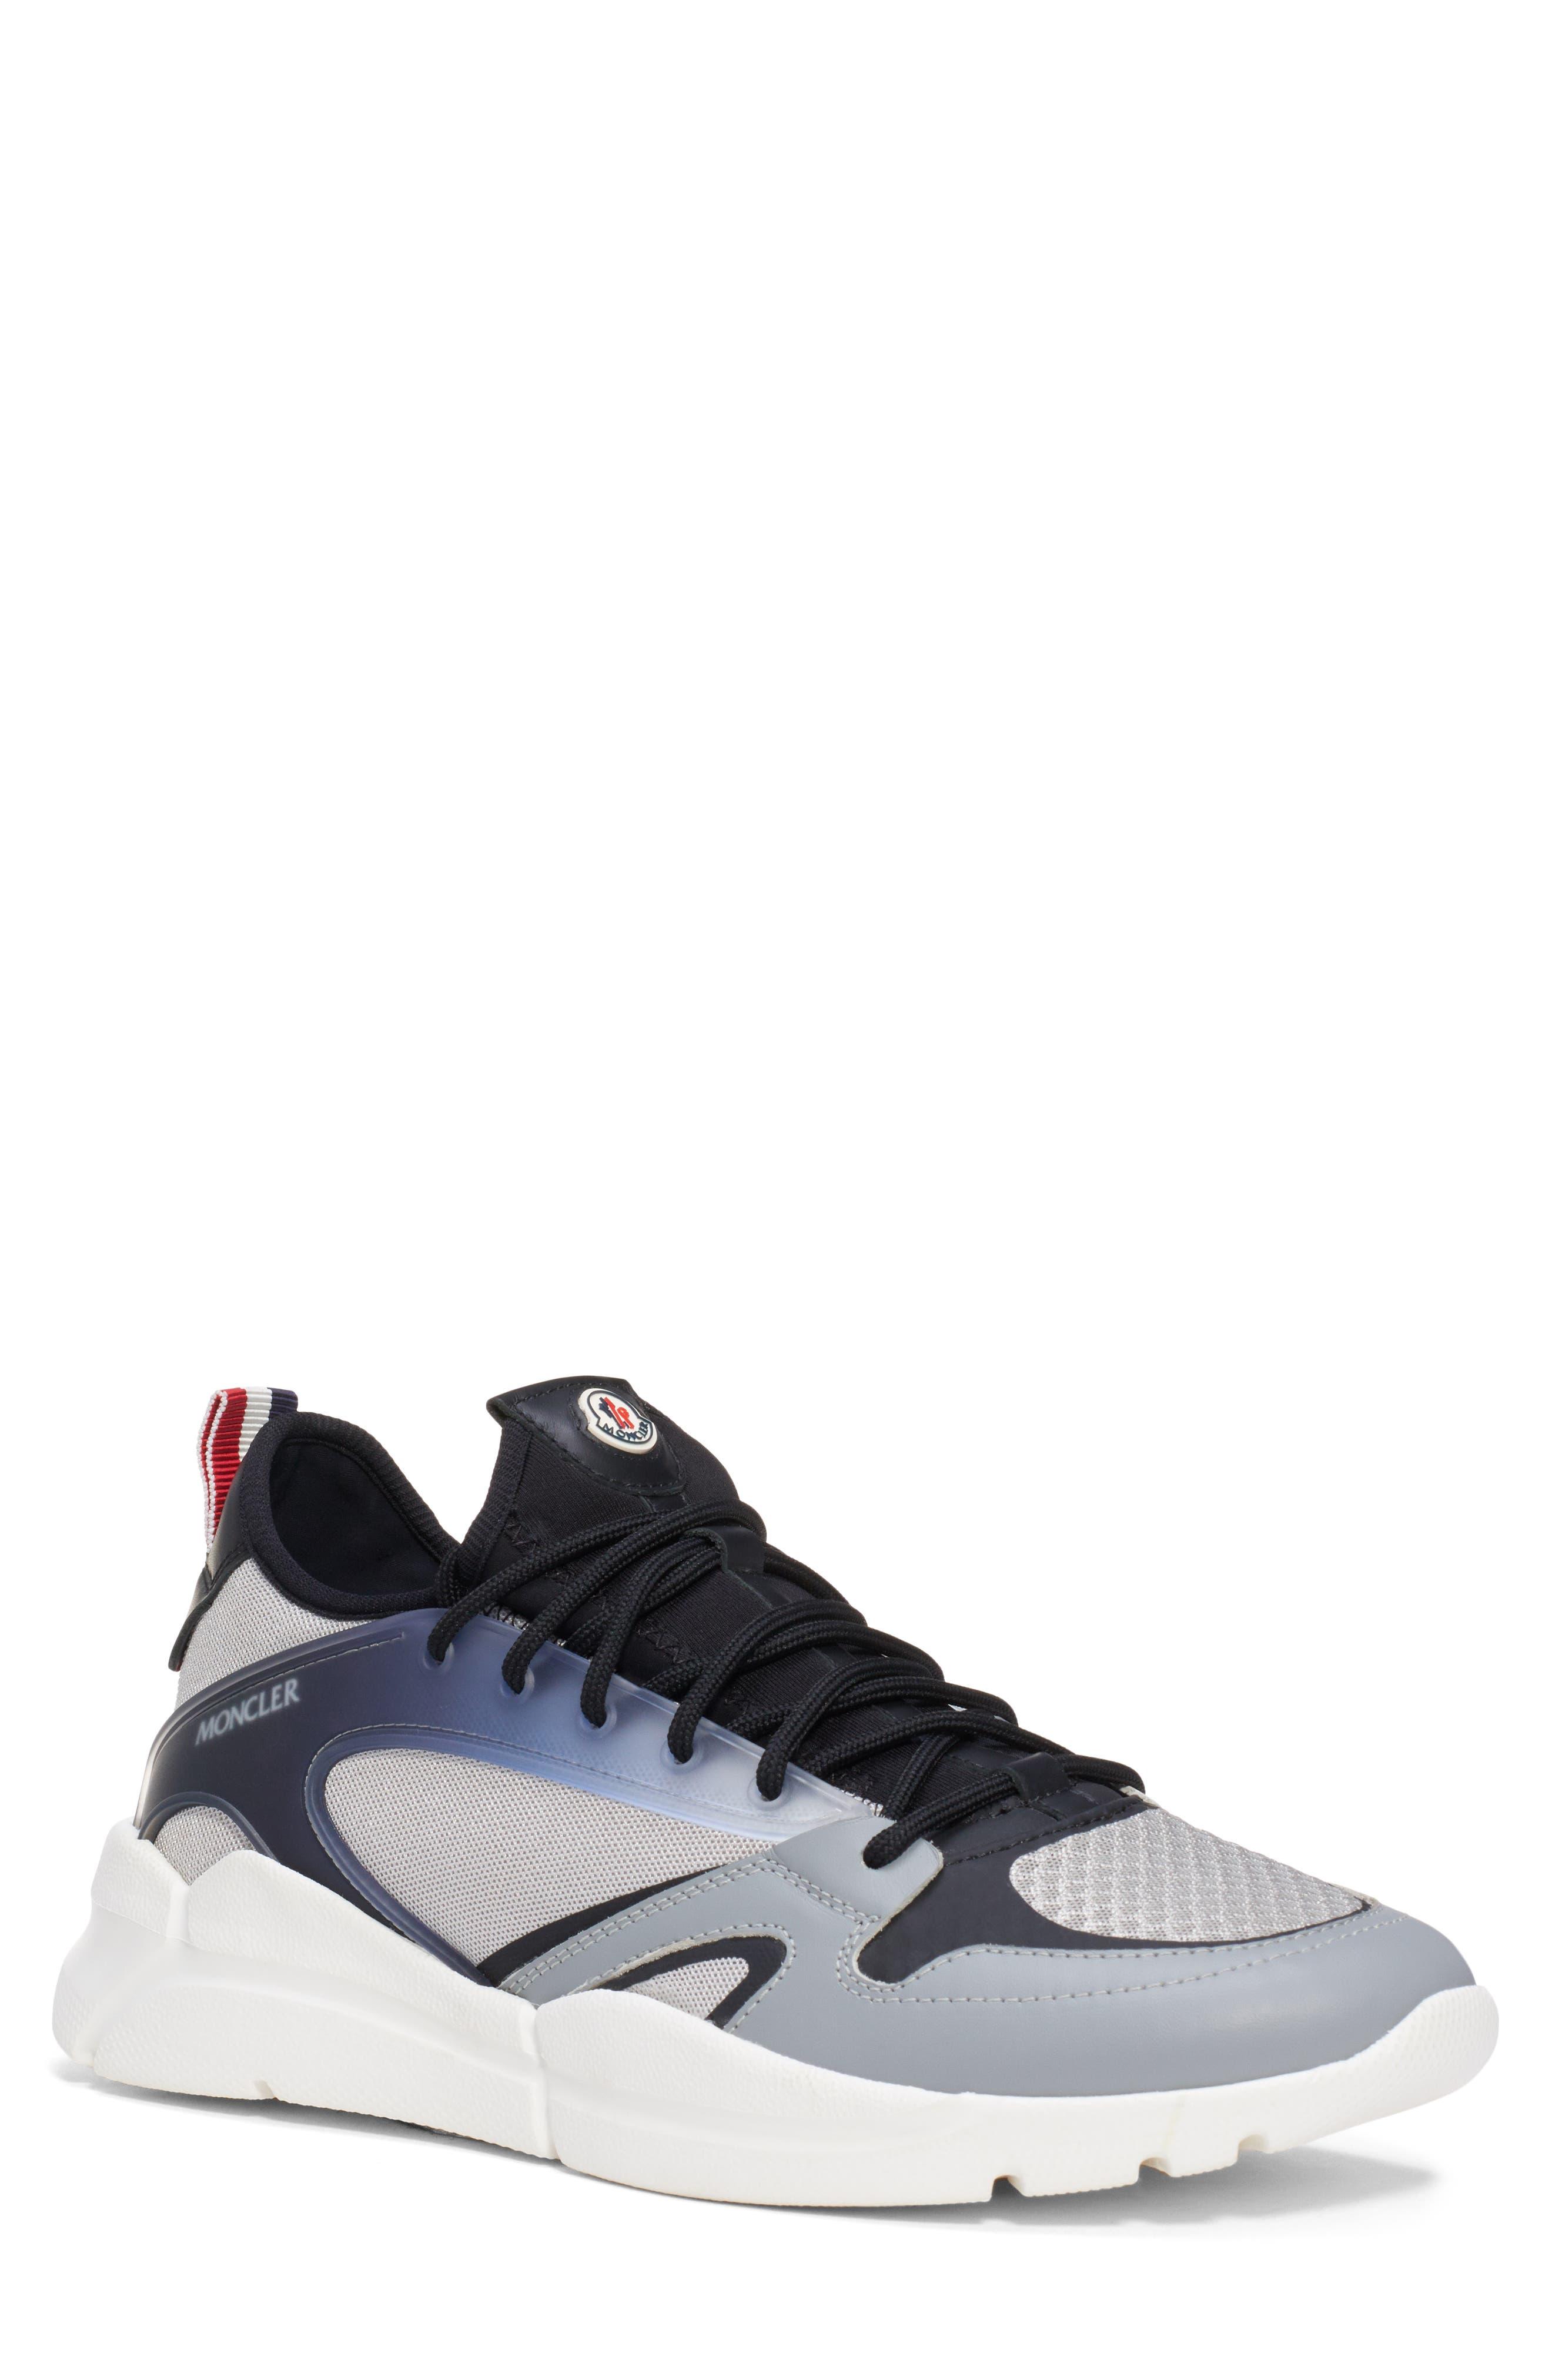 Moncler Anakin Sneaker (Men) | Nordstrom